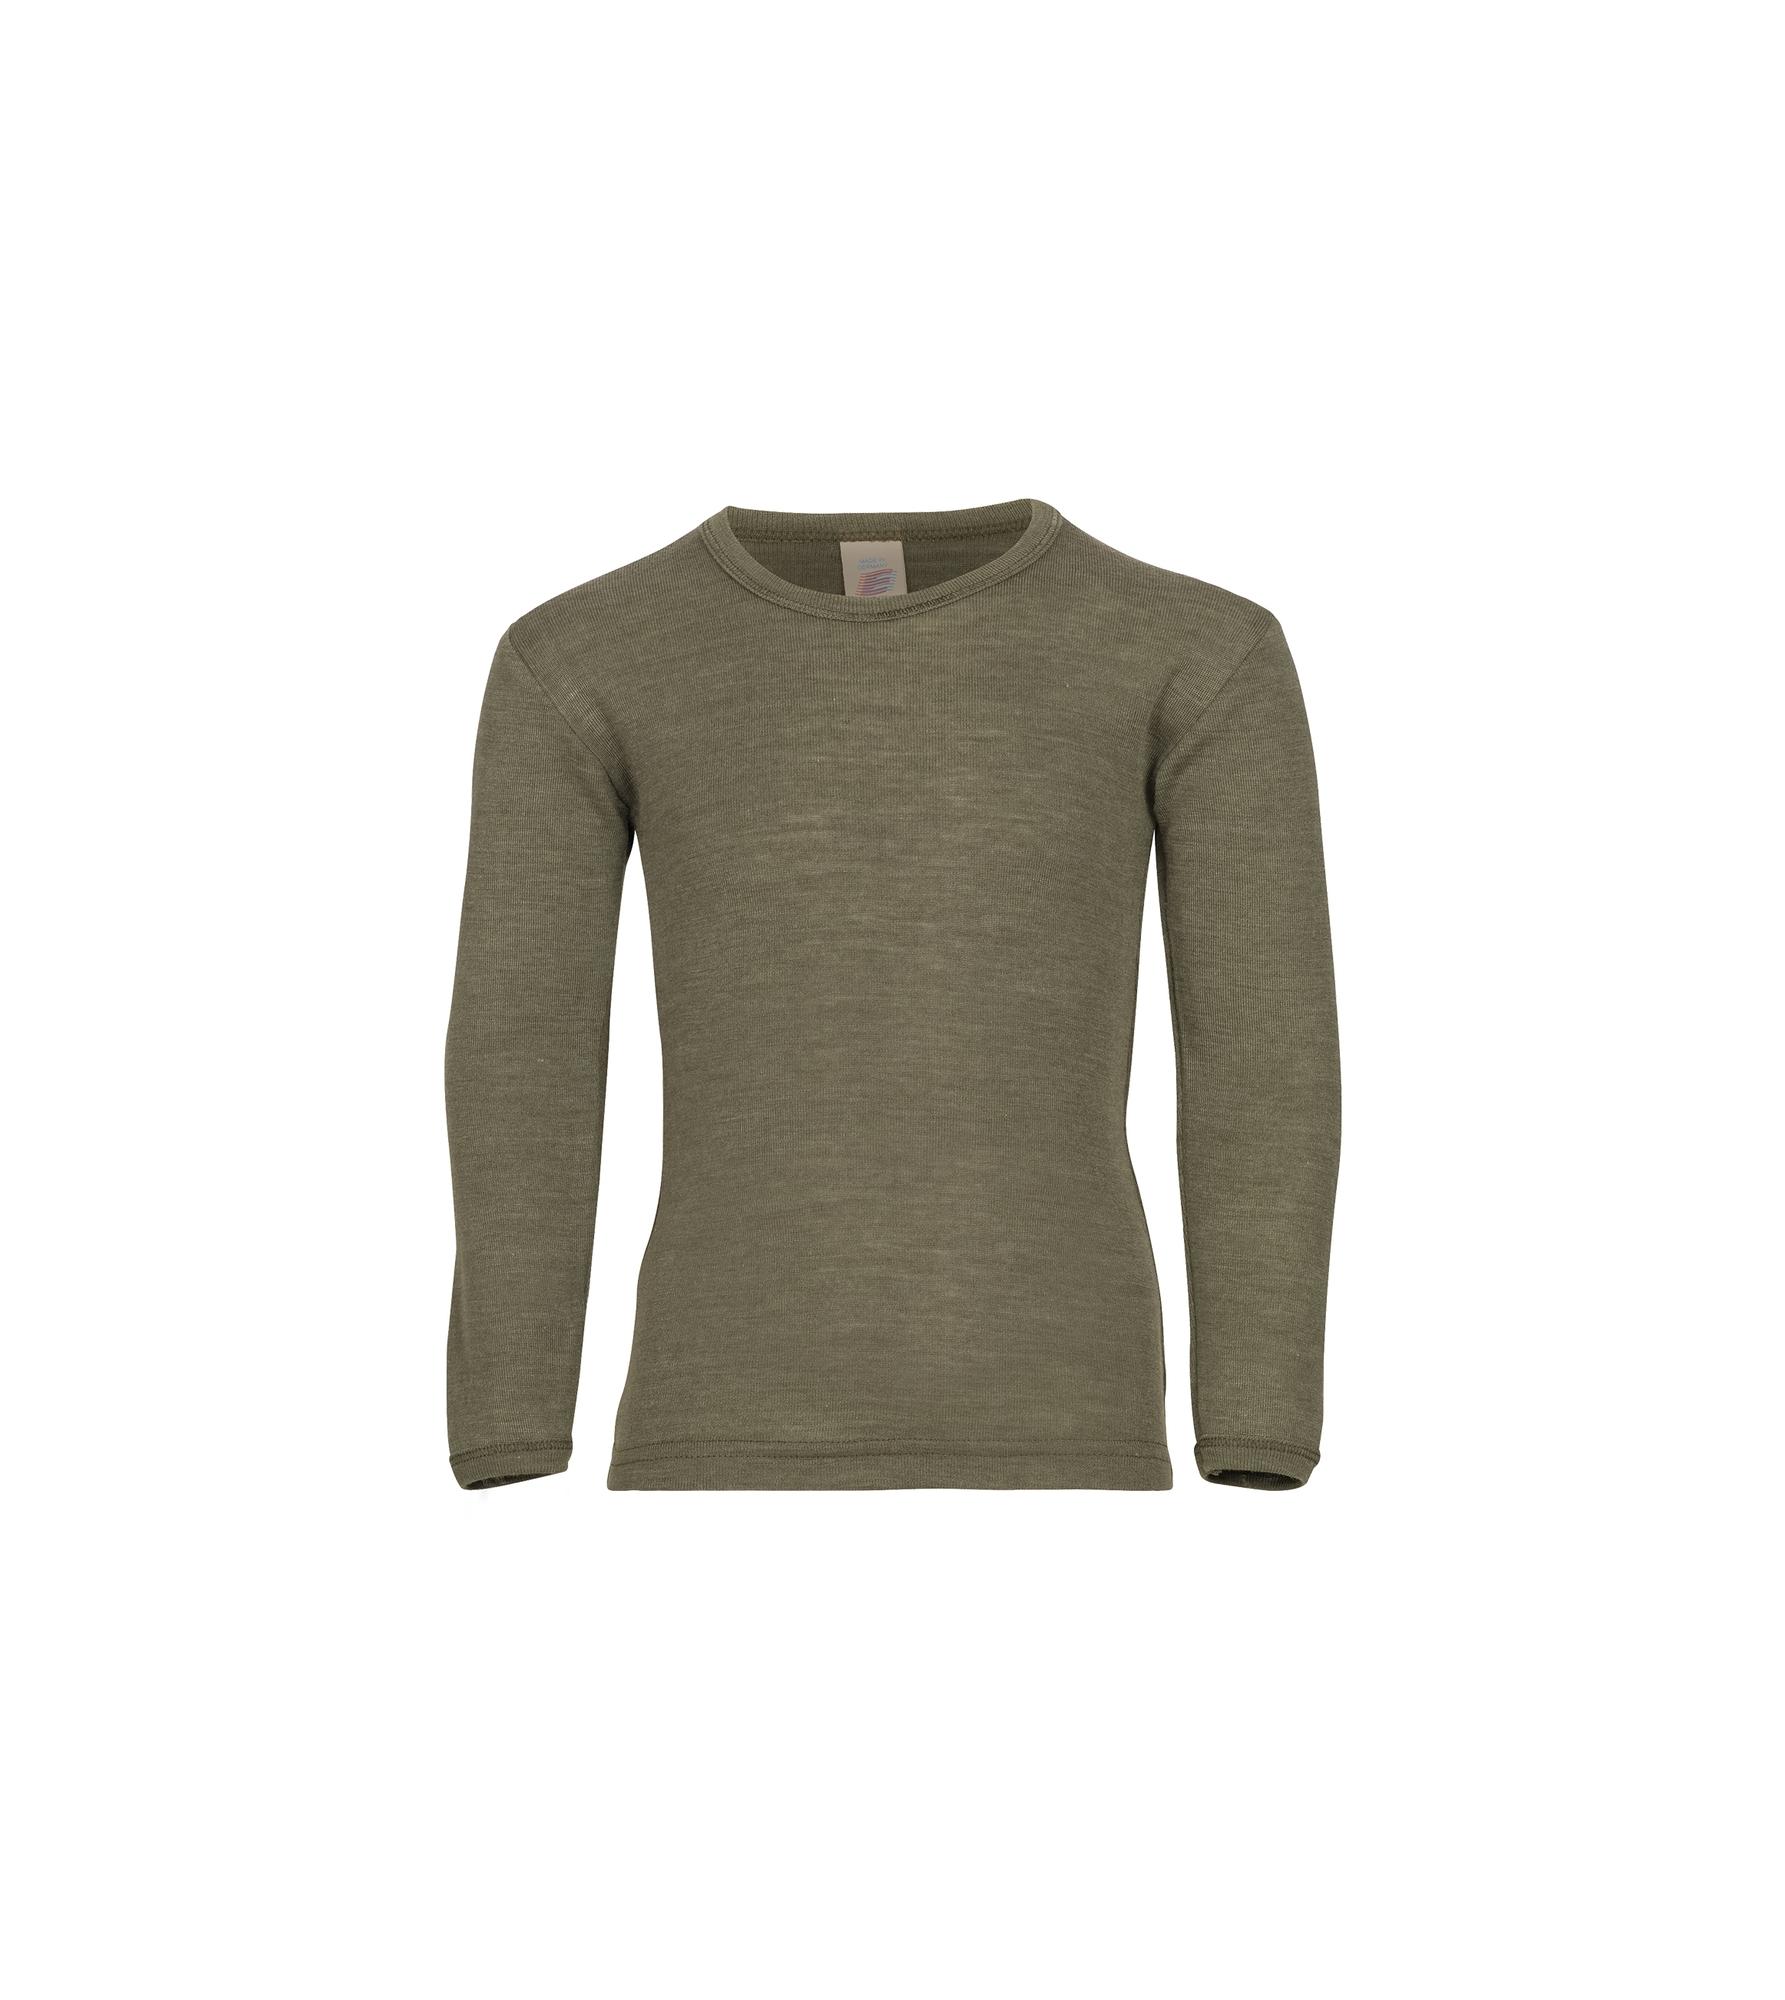 3-70-7810-kinder-shirt-langer-arm-43e-olive-707810_43e.jpg